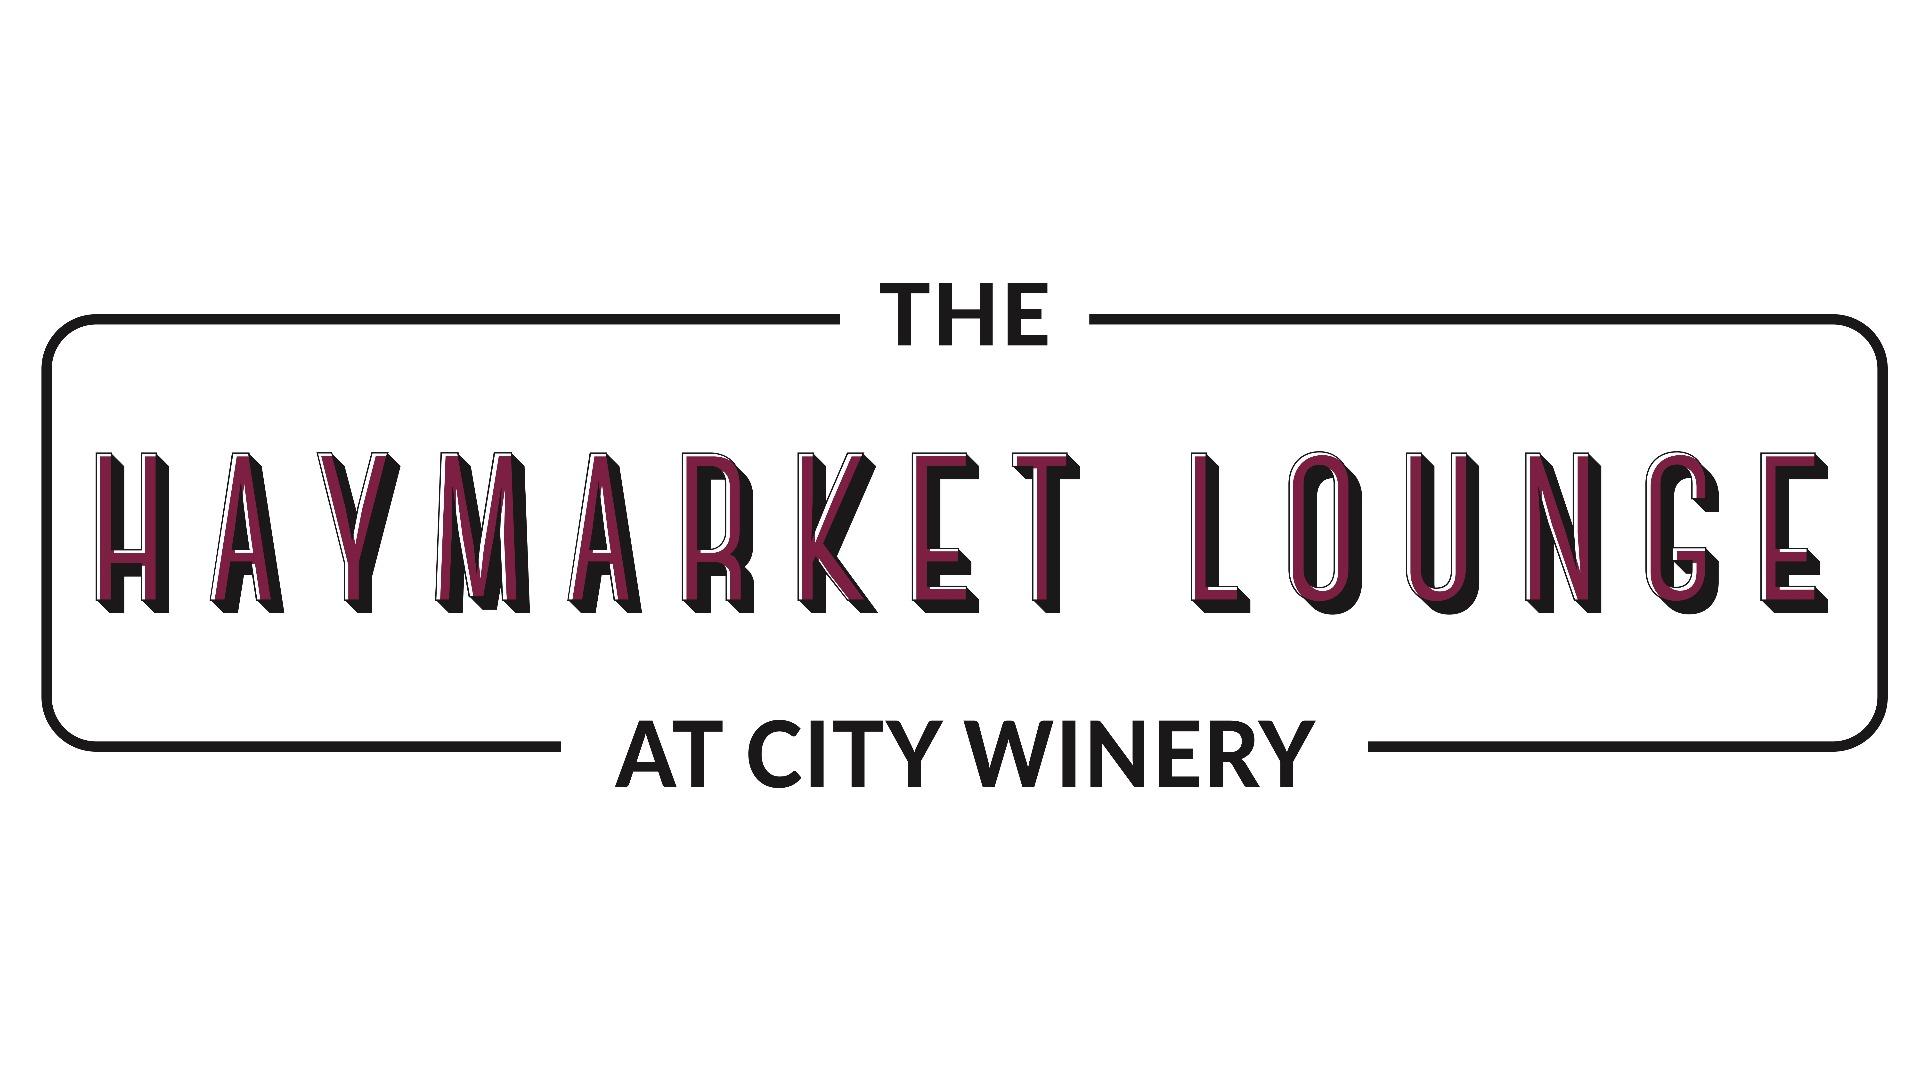 haymarket logo.jpg